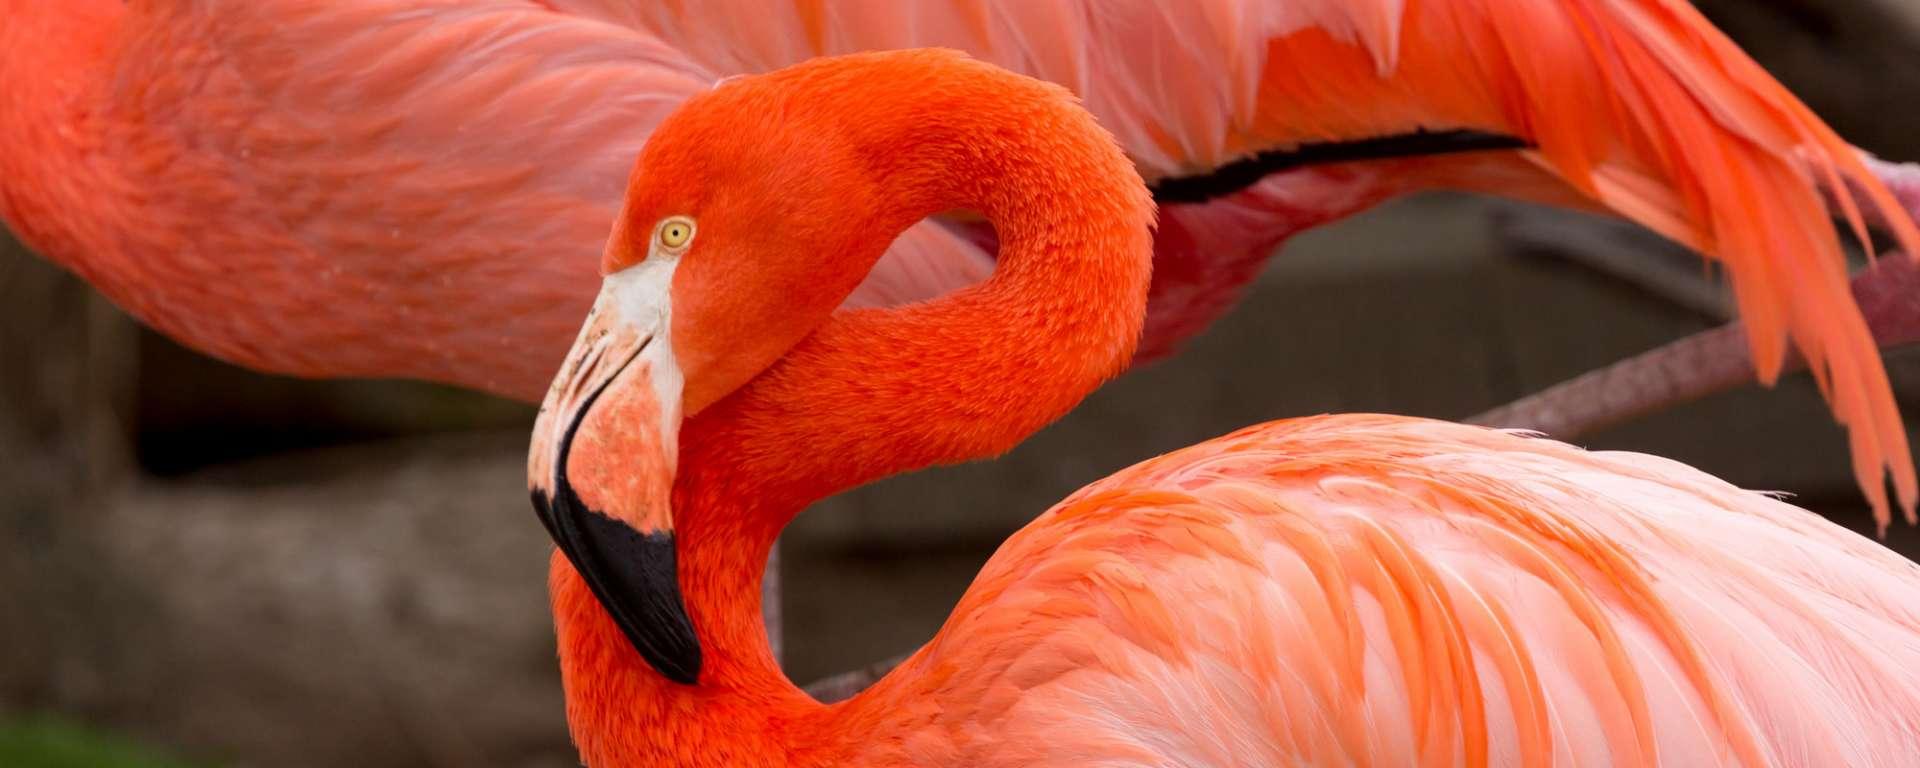 American Flamingo by Steve Murdock